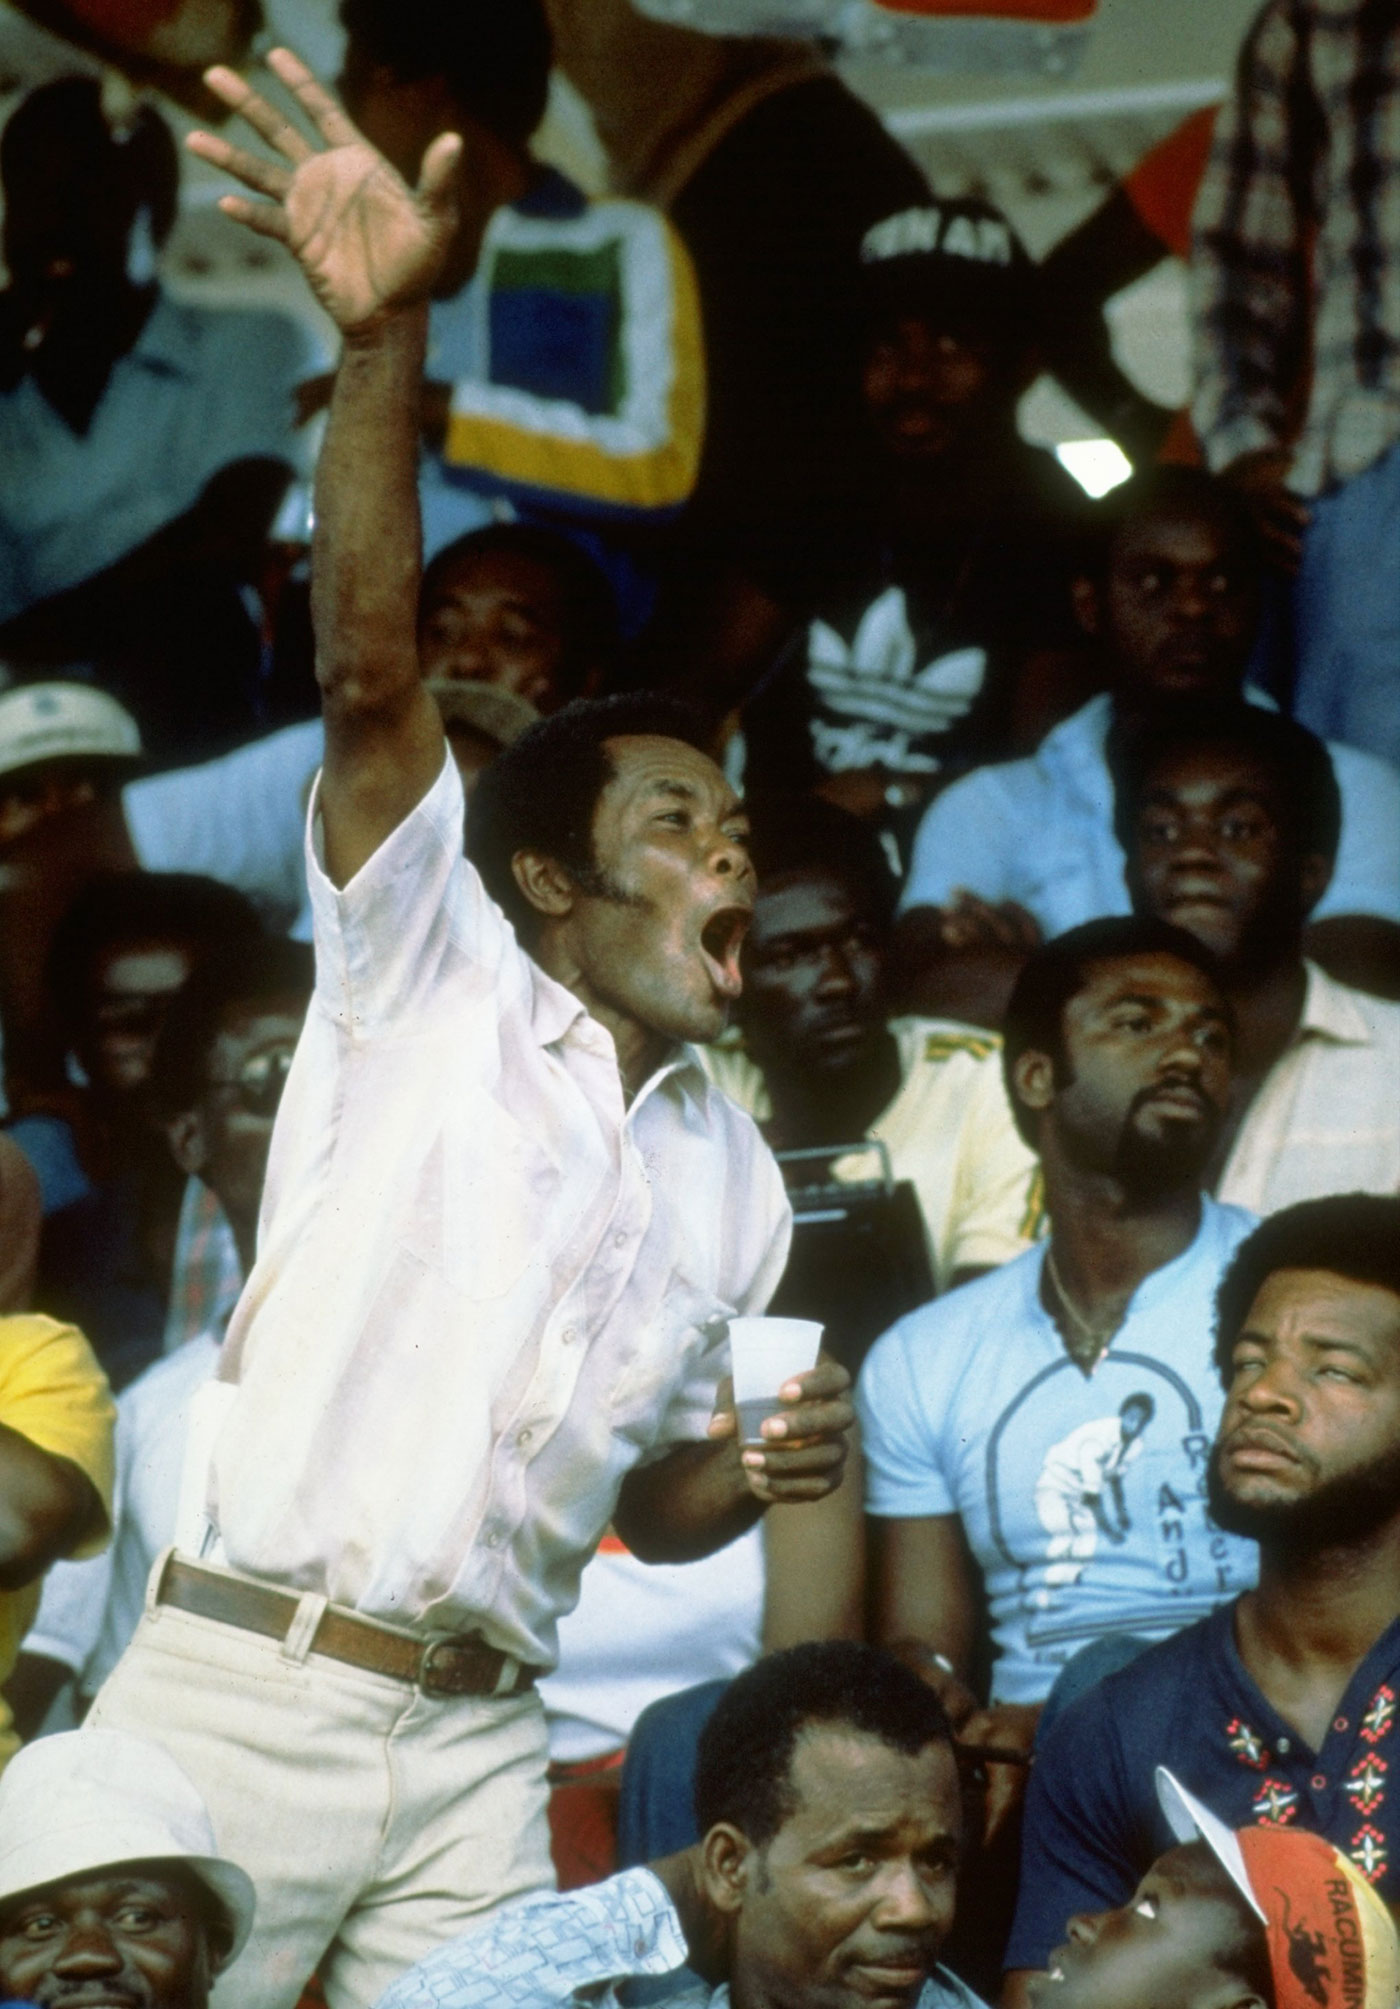 The Caribbean fan: joyful, appreciative, fun and, sometimes, noisy